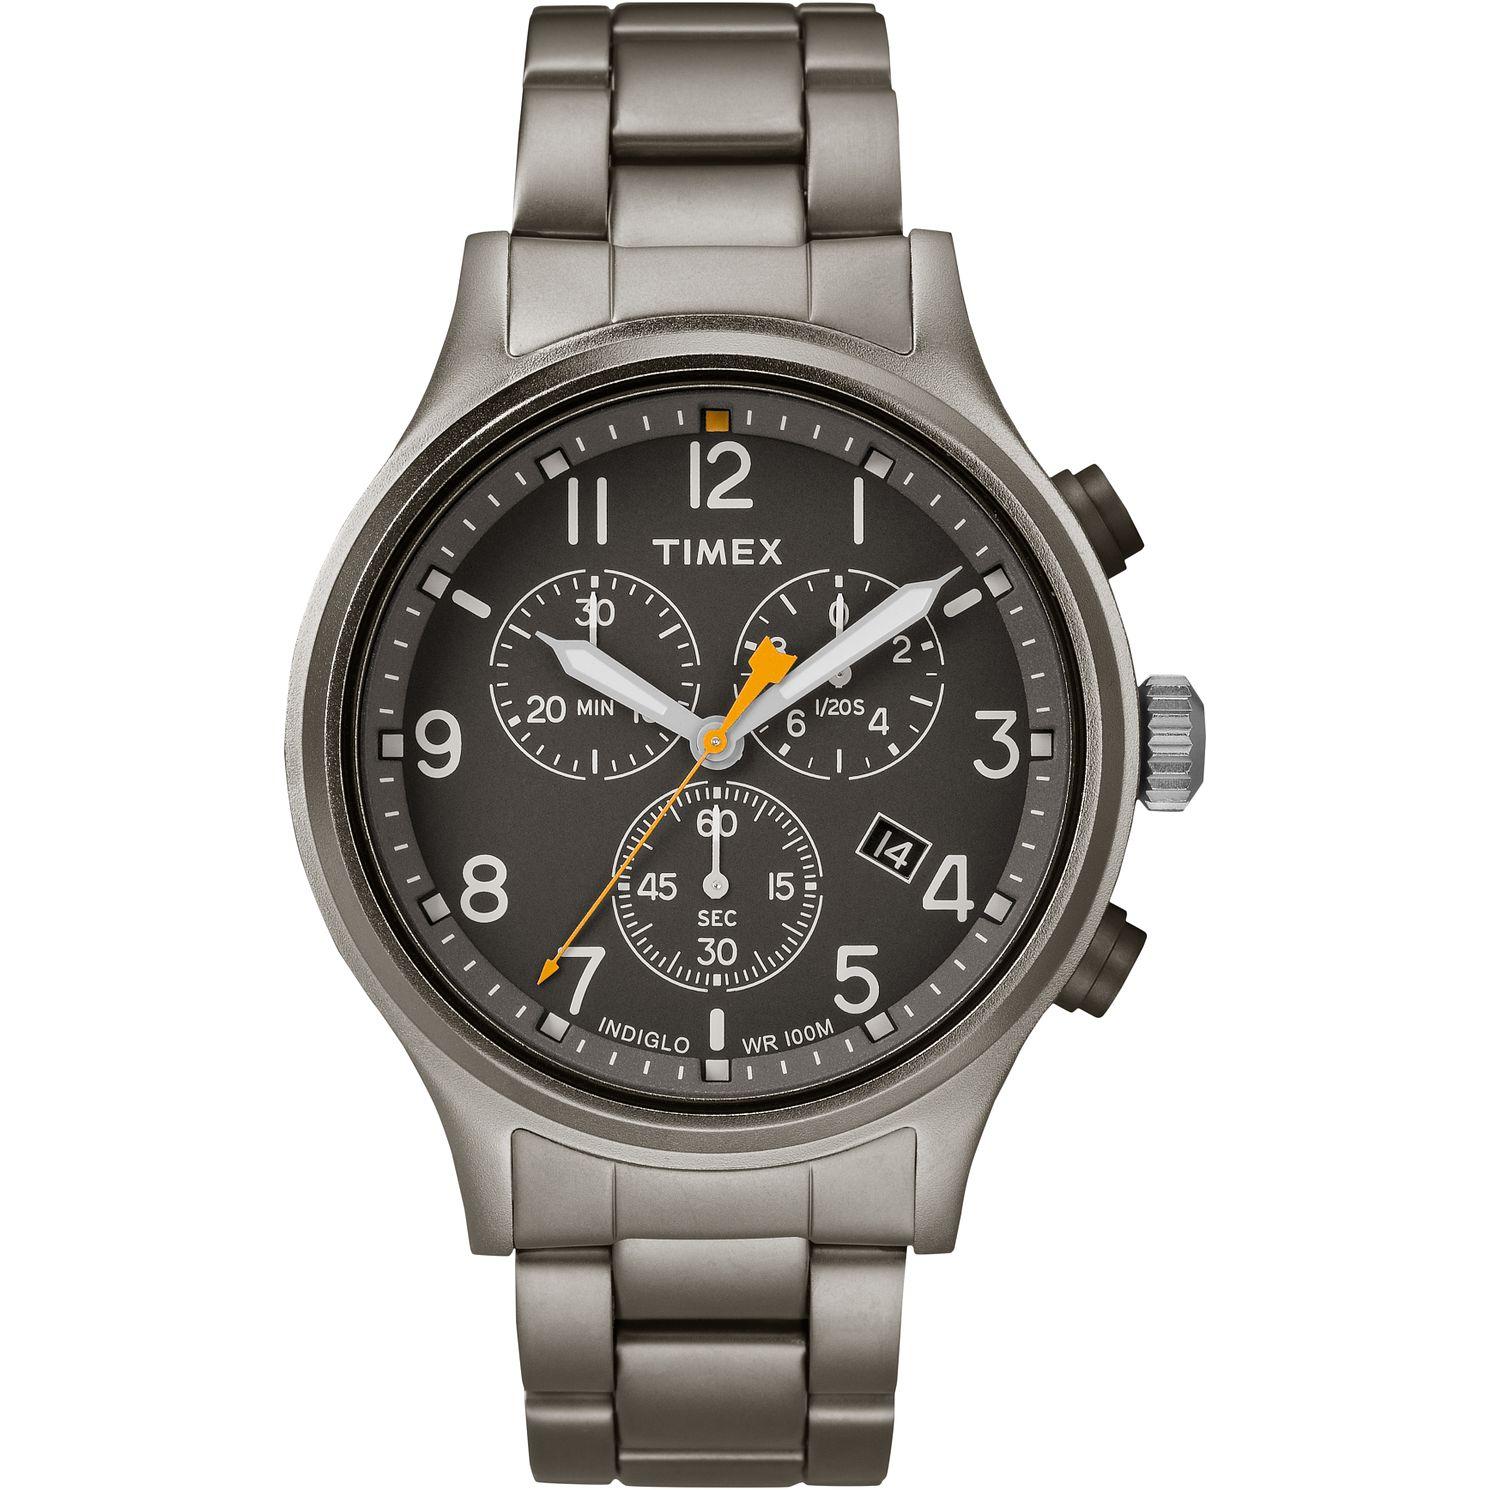 Timex Allied Men's Stainless Steel Bracelet Watch £55.25 @ Ernest Jones (Free Delivery)